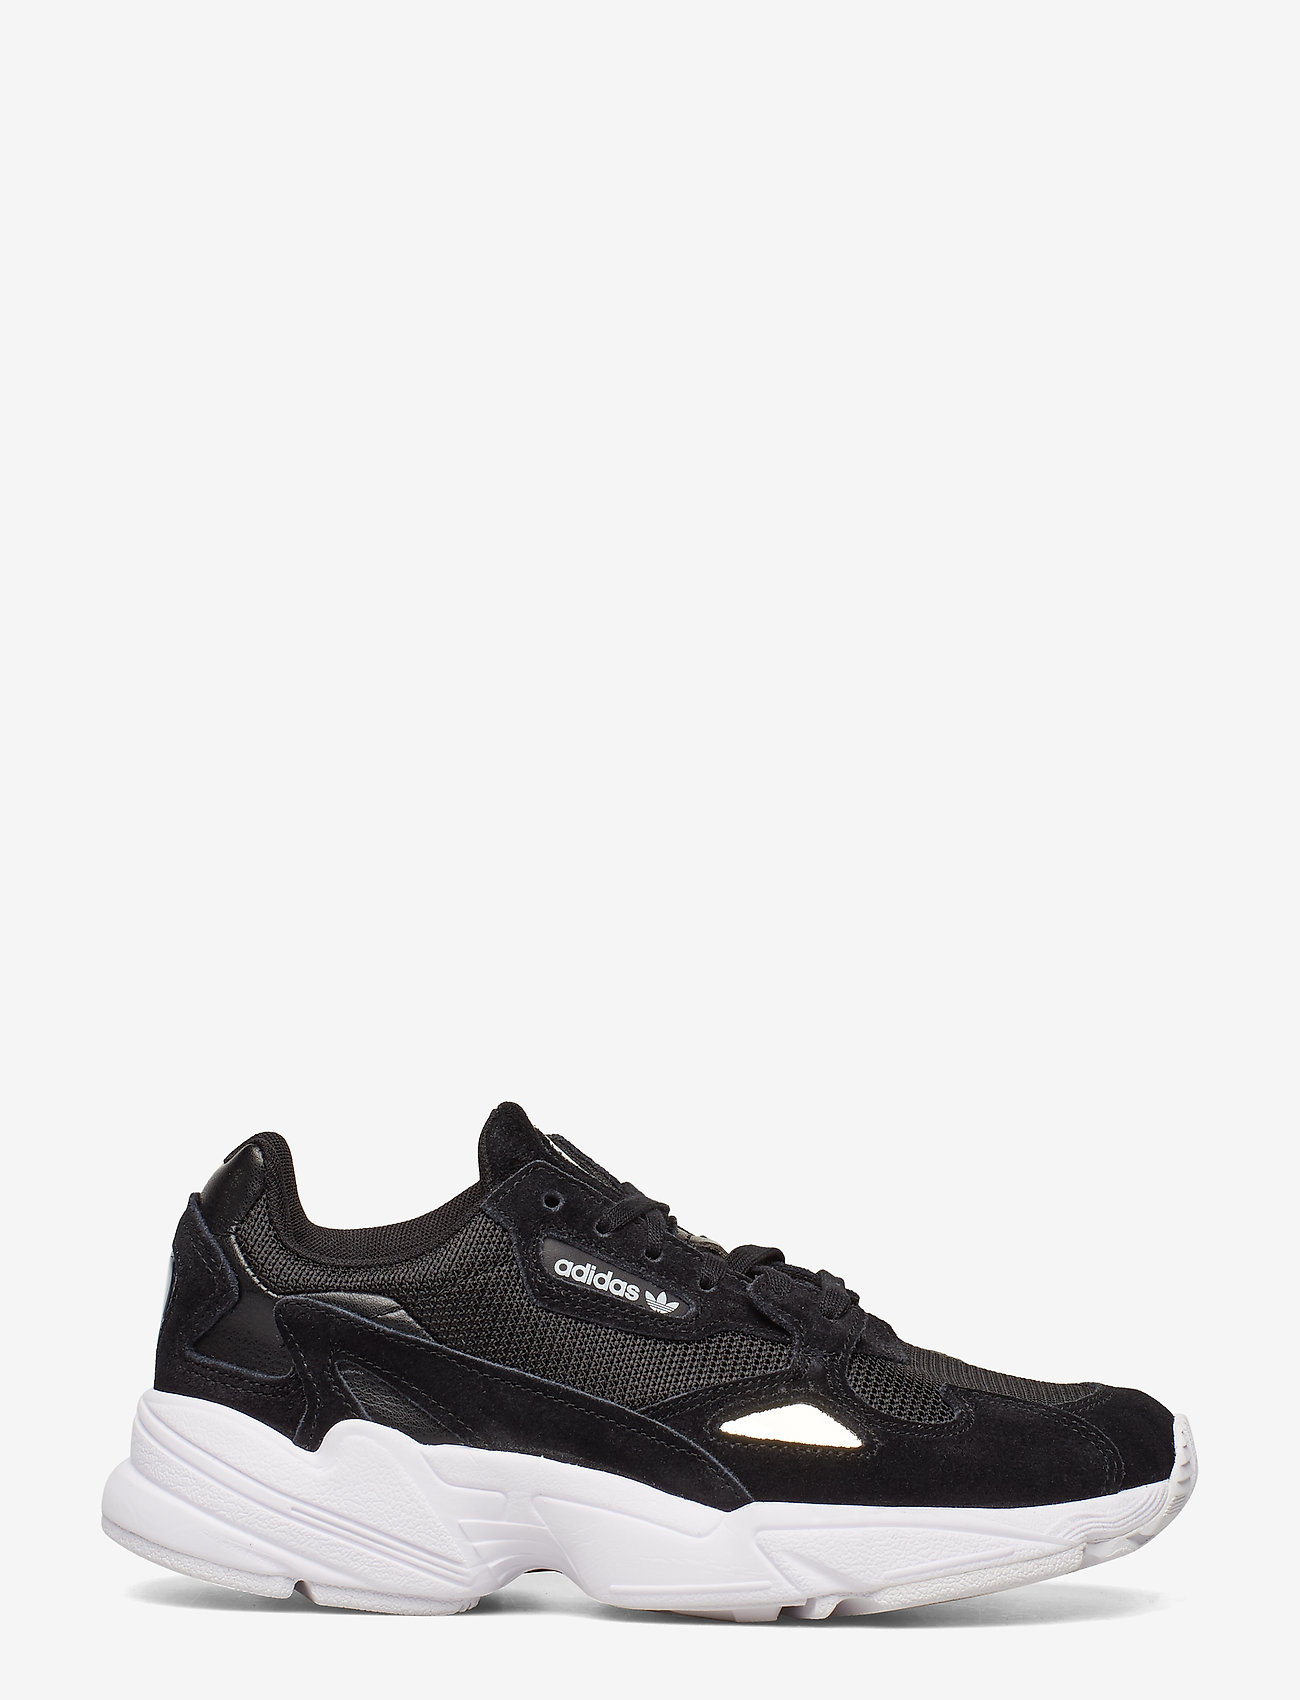 adidas Originals - FALCON W - chunky sneakers - cblack/cblack/ftwwht - 1